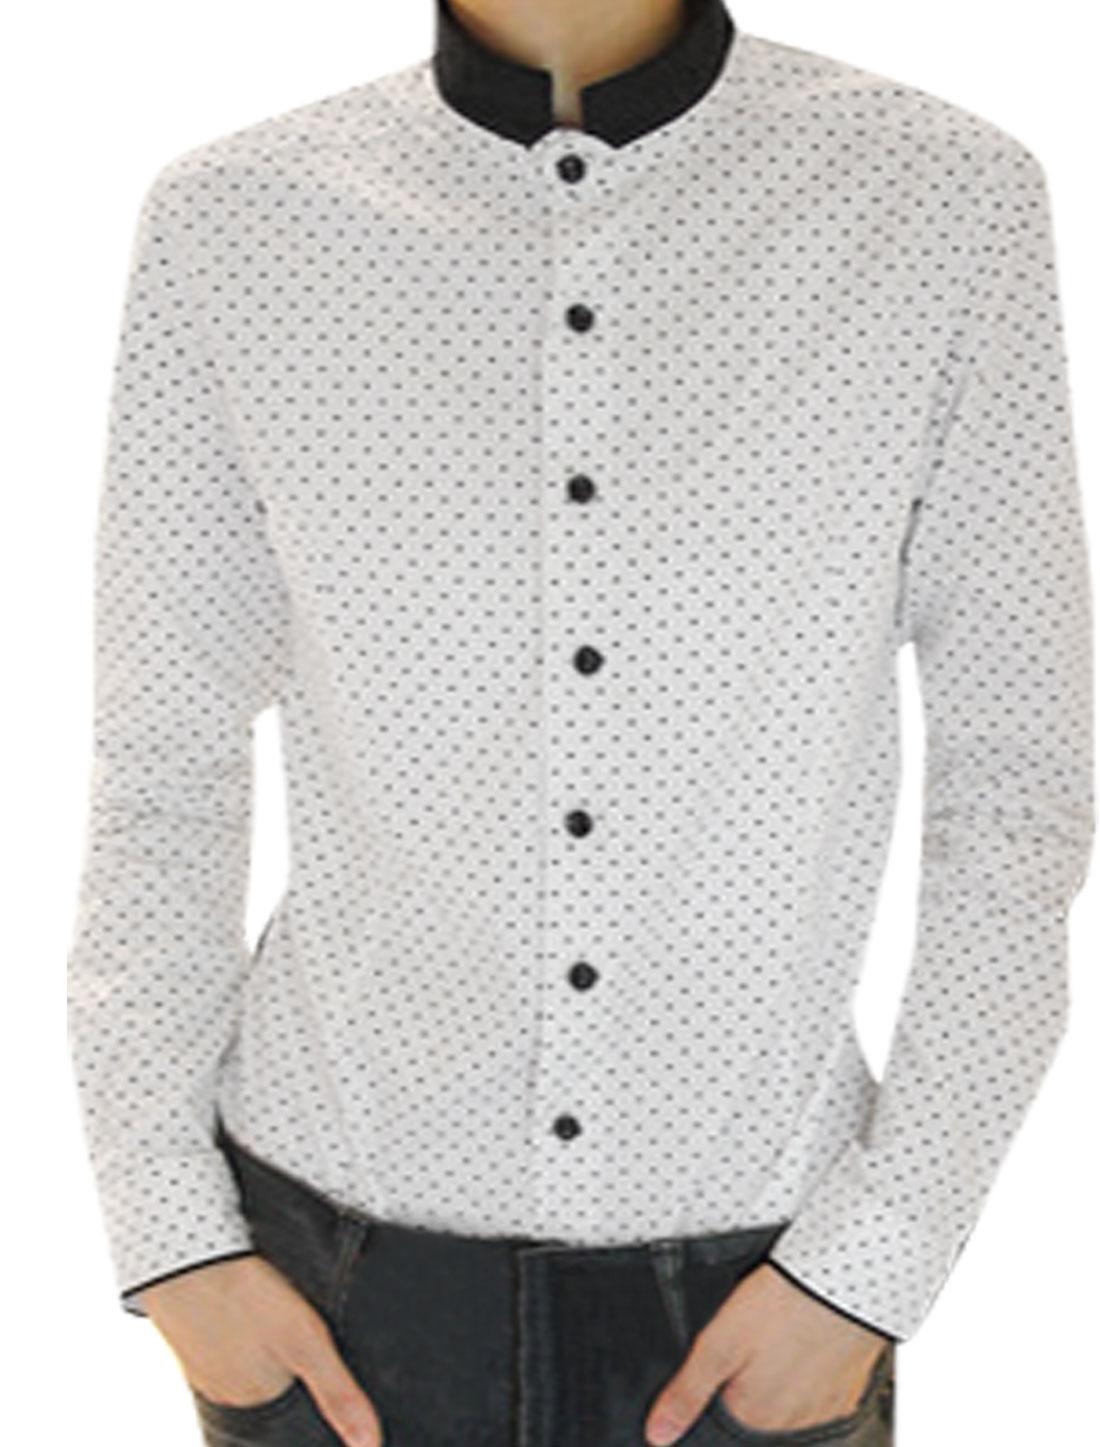 Mens Korean Style Long Sleeve Polka Dot Casual Shirt White Black S